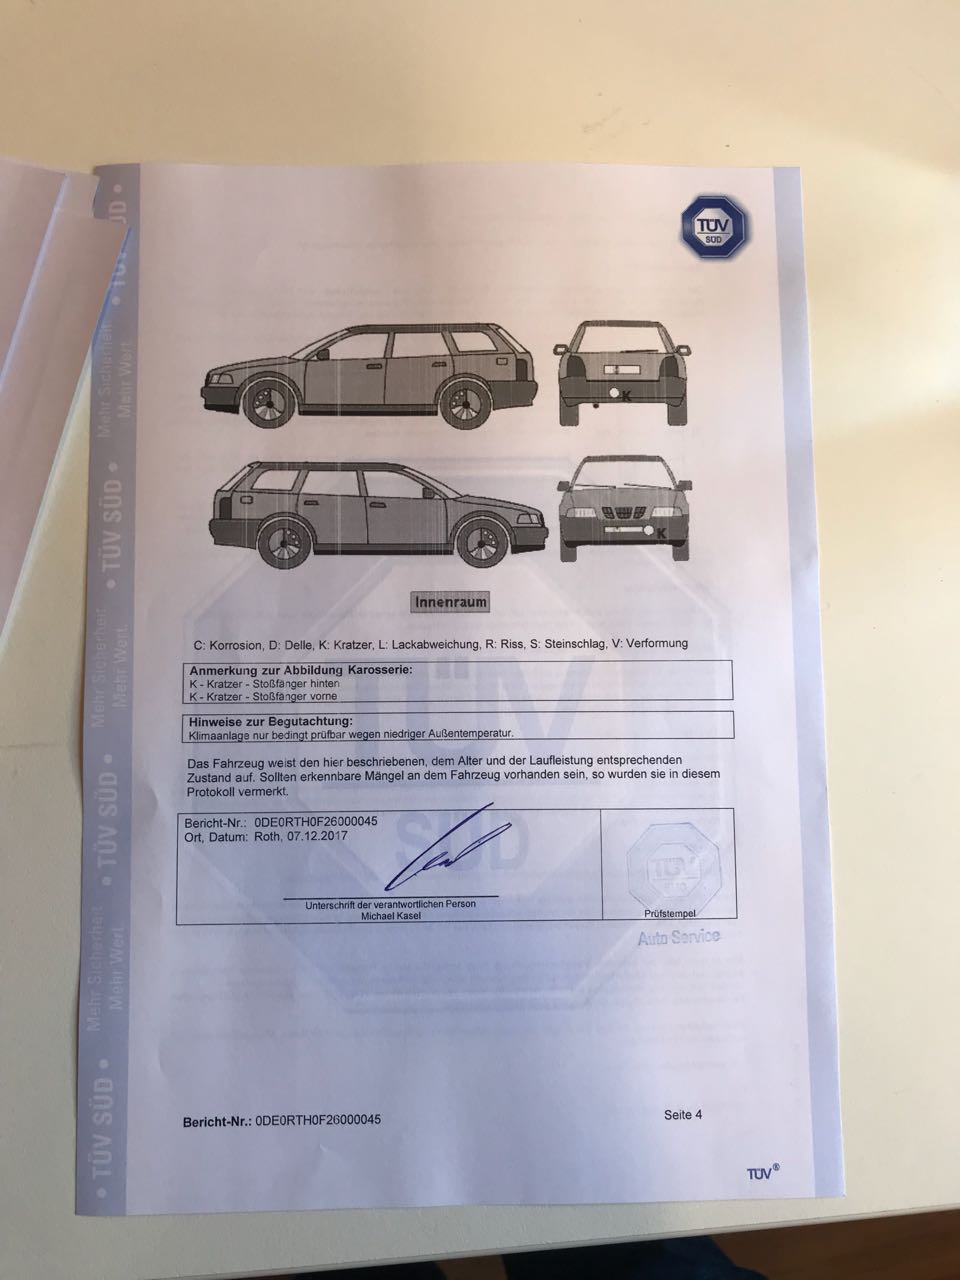 TÜV - Toyota Rav 4 - Пълно Оборудване - 2010 - 2.2 D4D - 150 к.с. - 11600 (4)